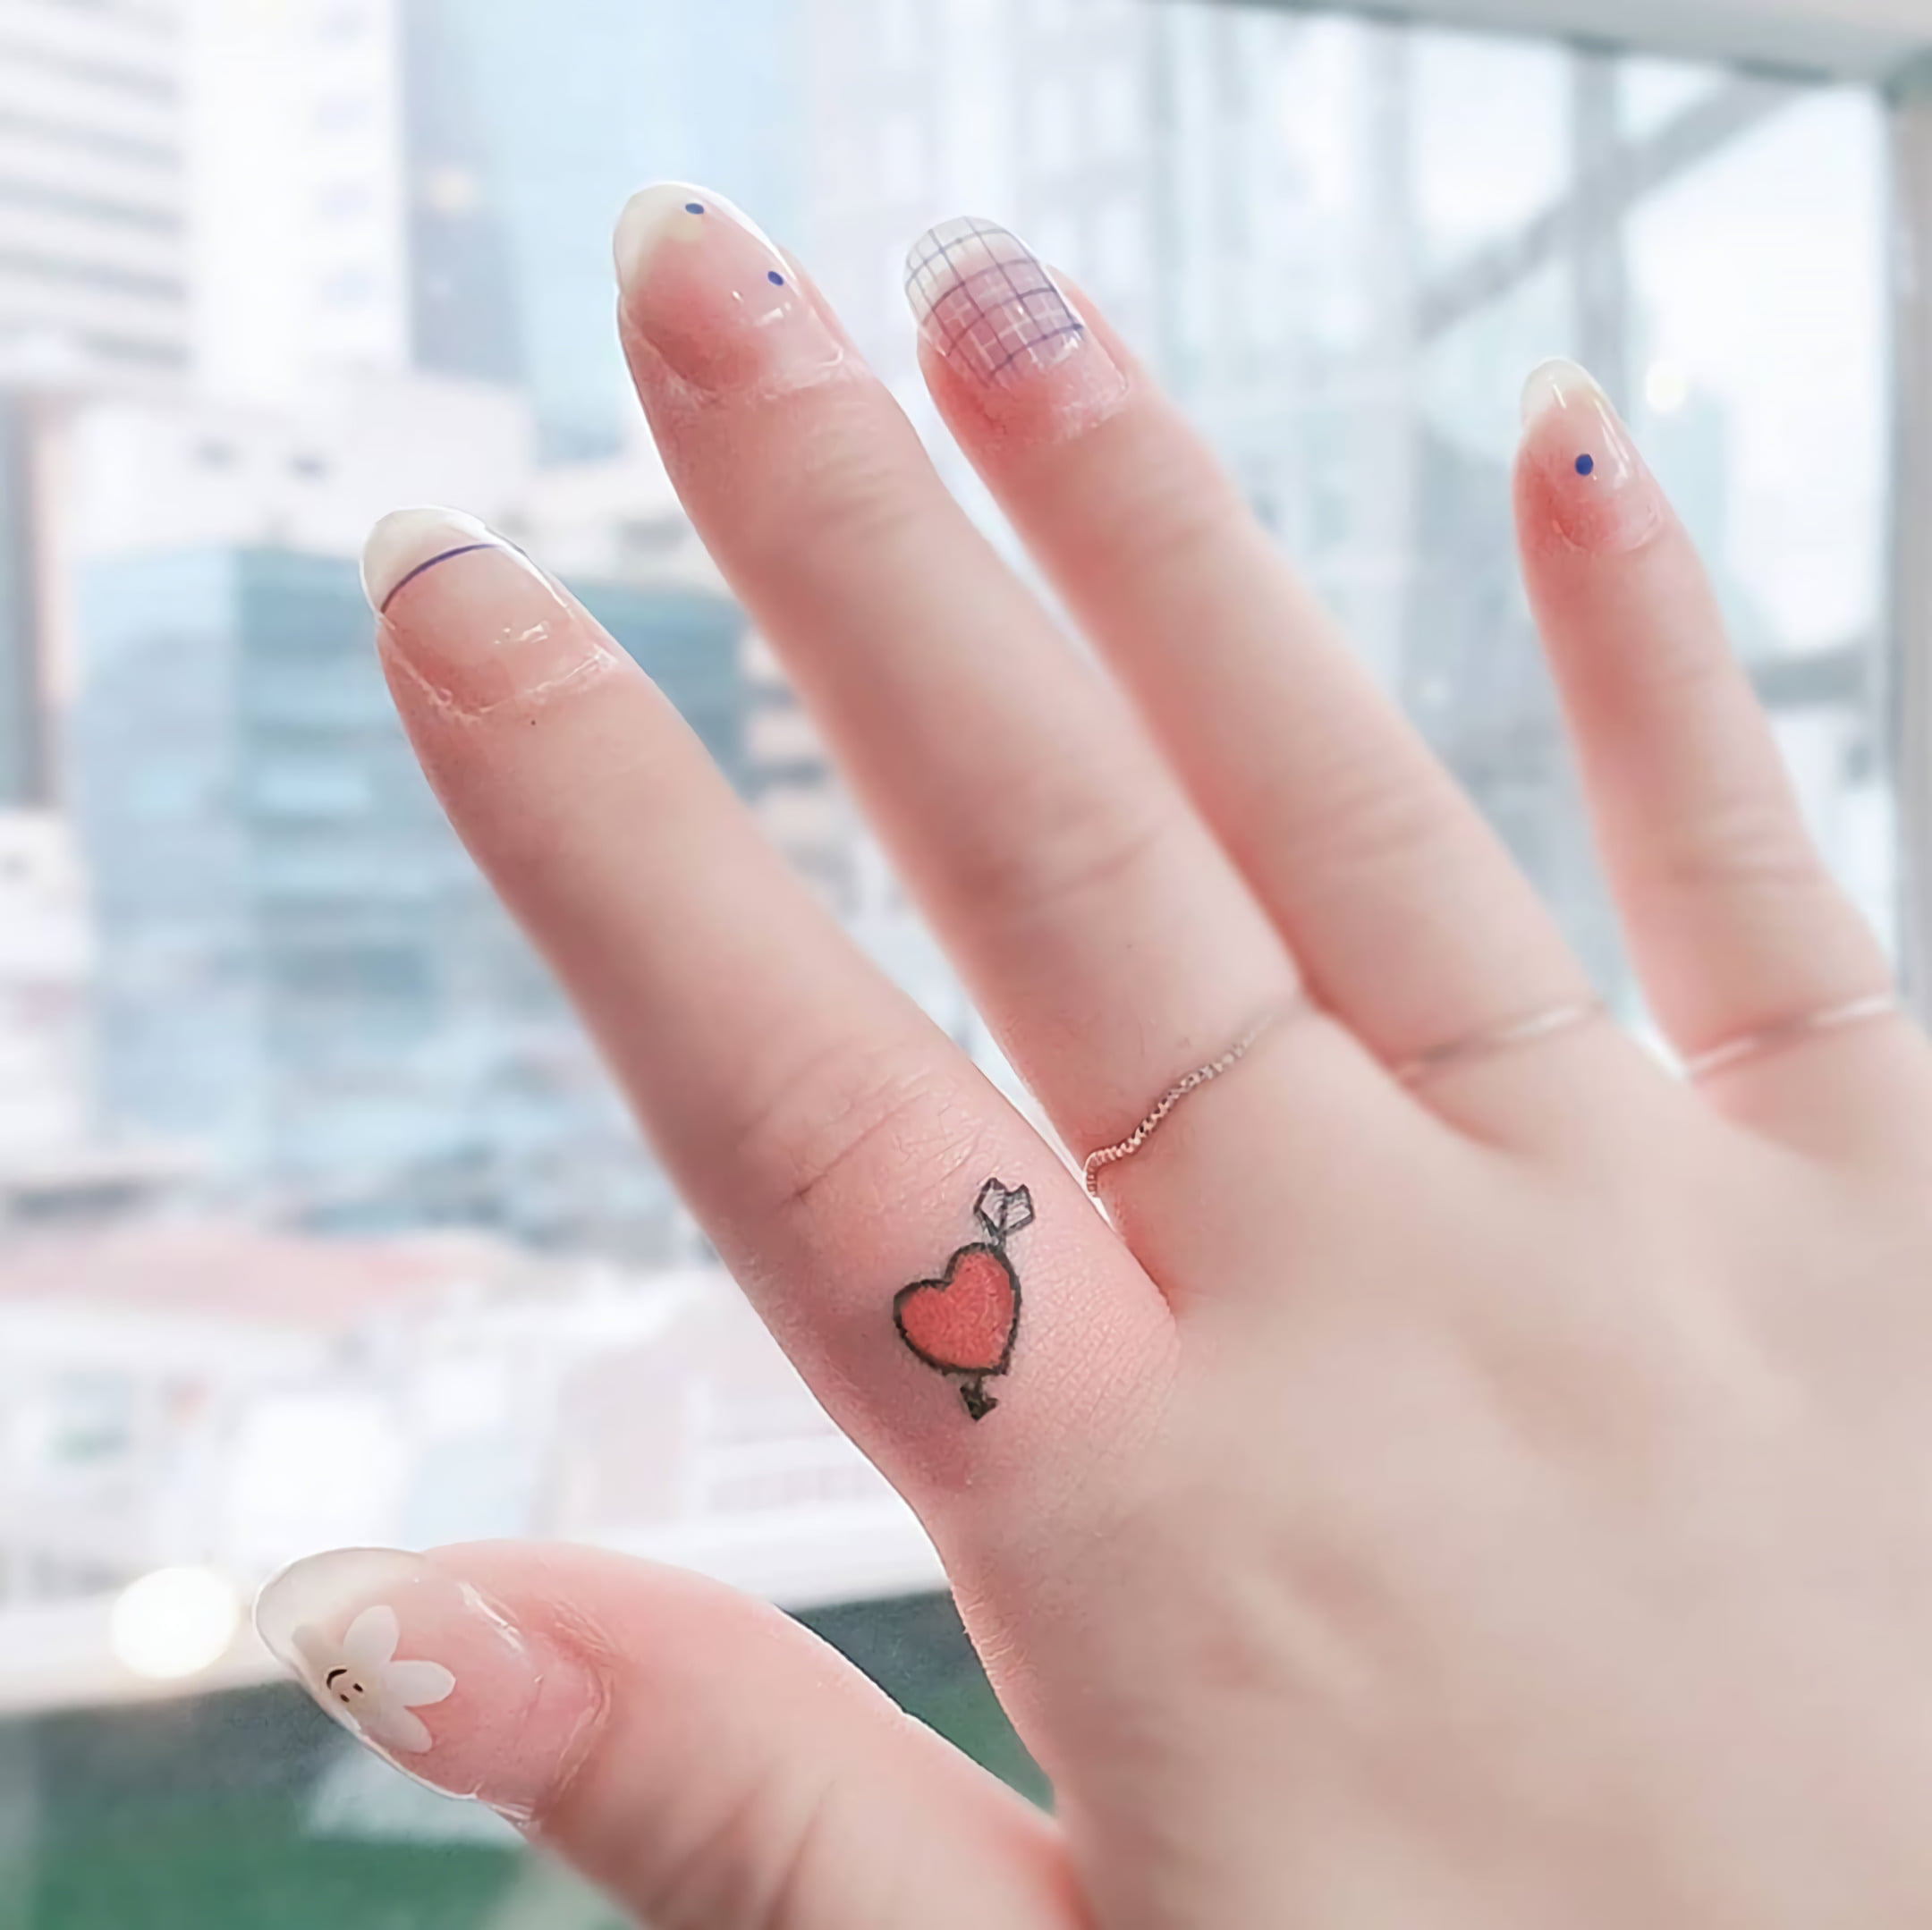 стильное тату сердца на пальце